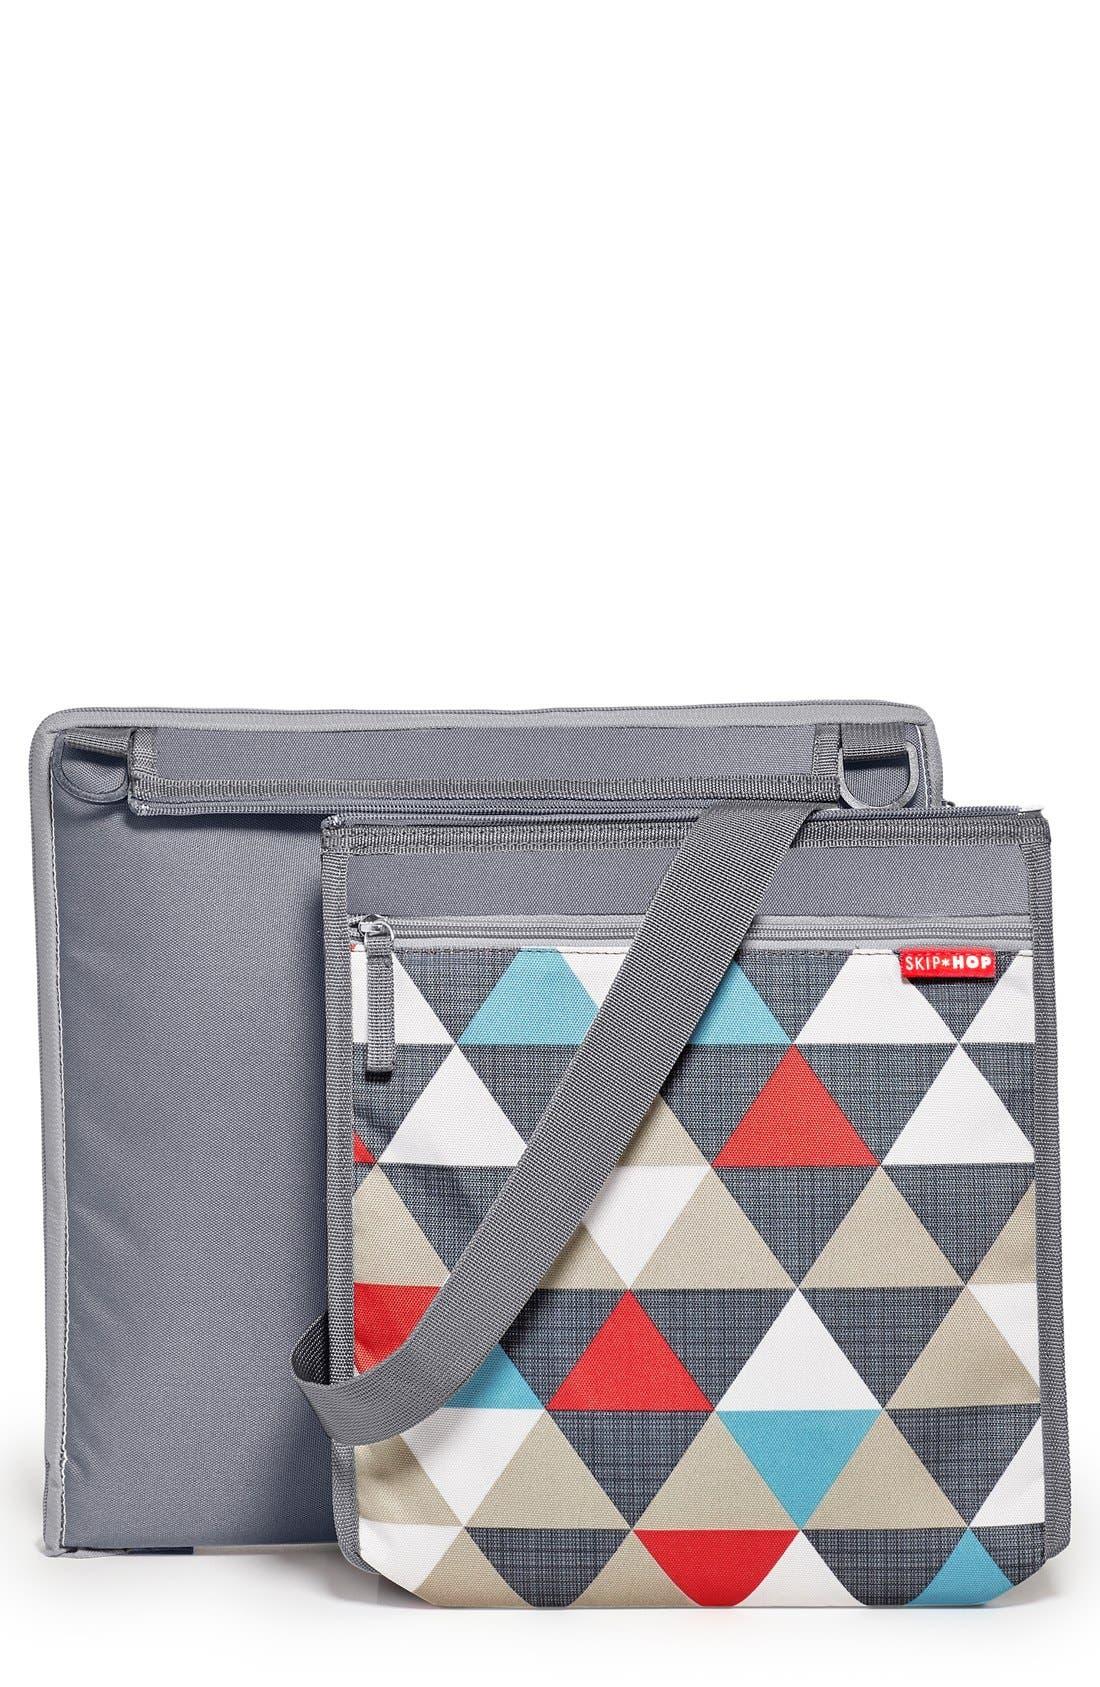 'Central Park' Outdoor Blanket & Cooler Bag,                         Main,                         color, Triangles